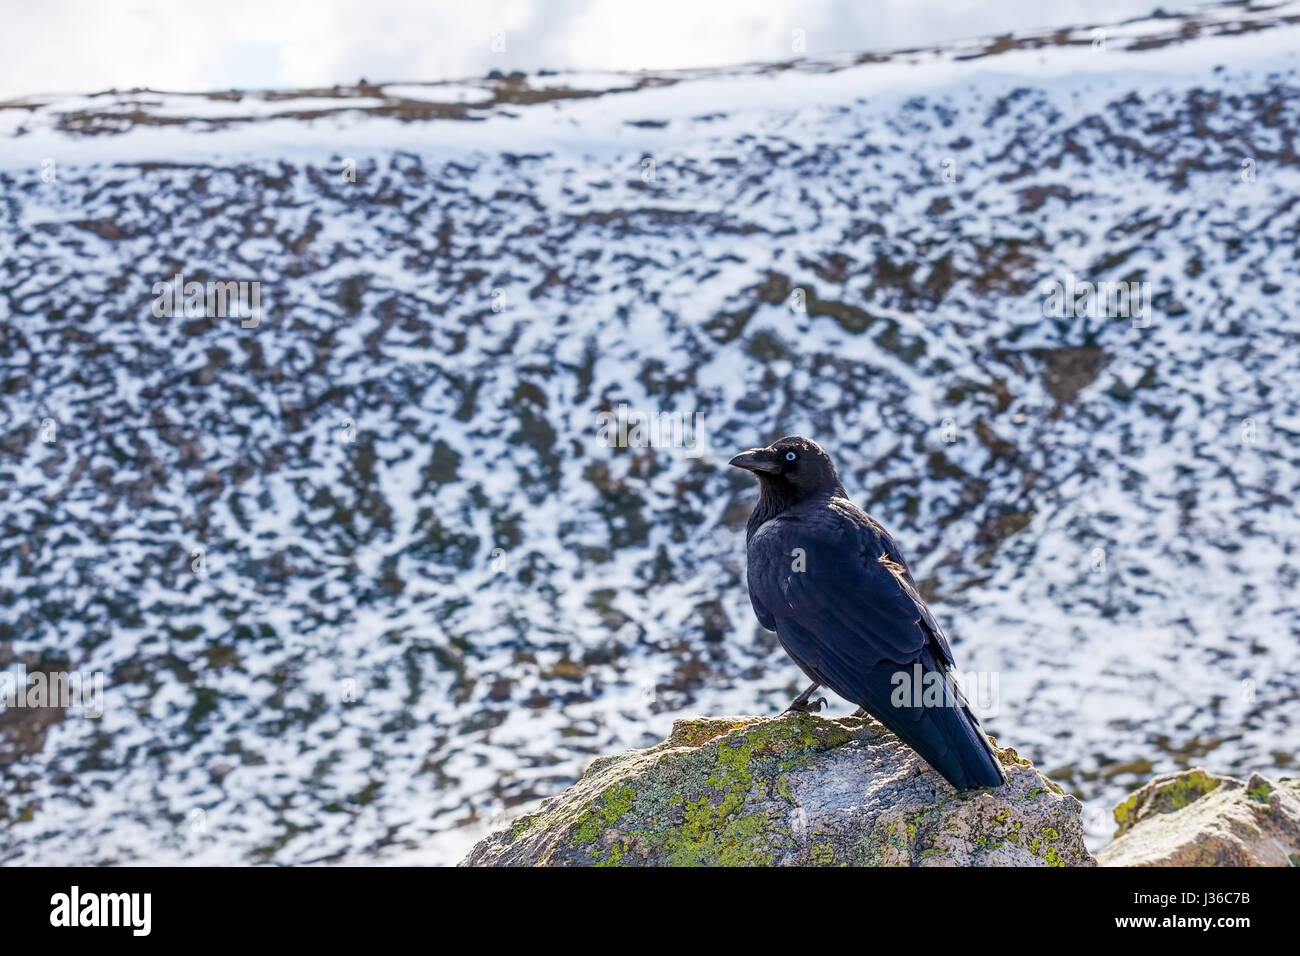 Portrait of Australian Raven at Mount Kosciuszko National Park - Stock Image